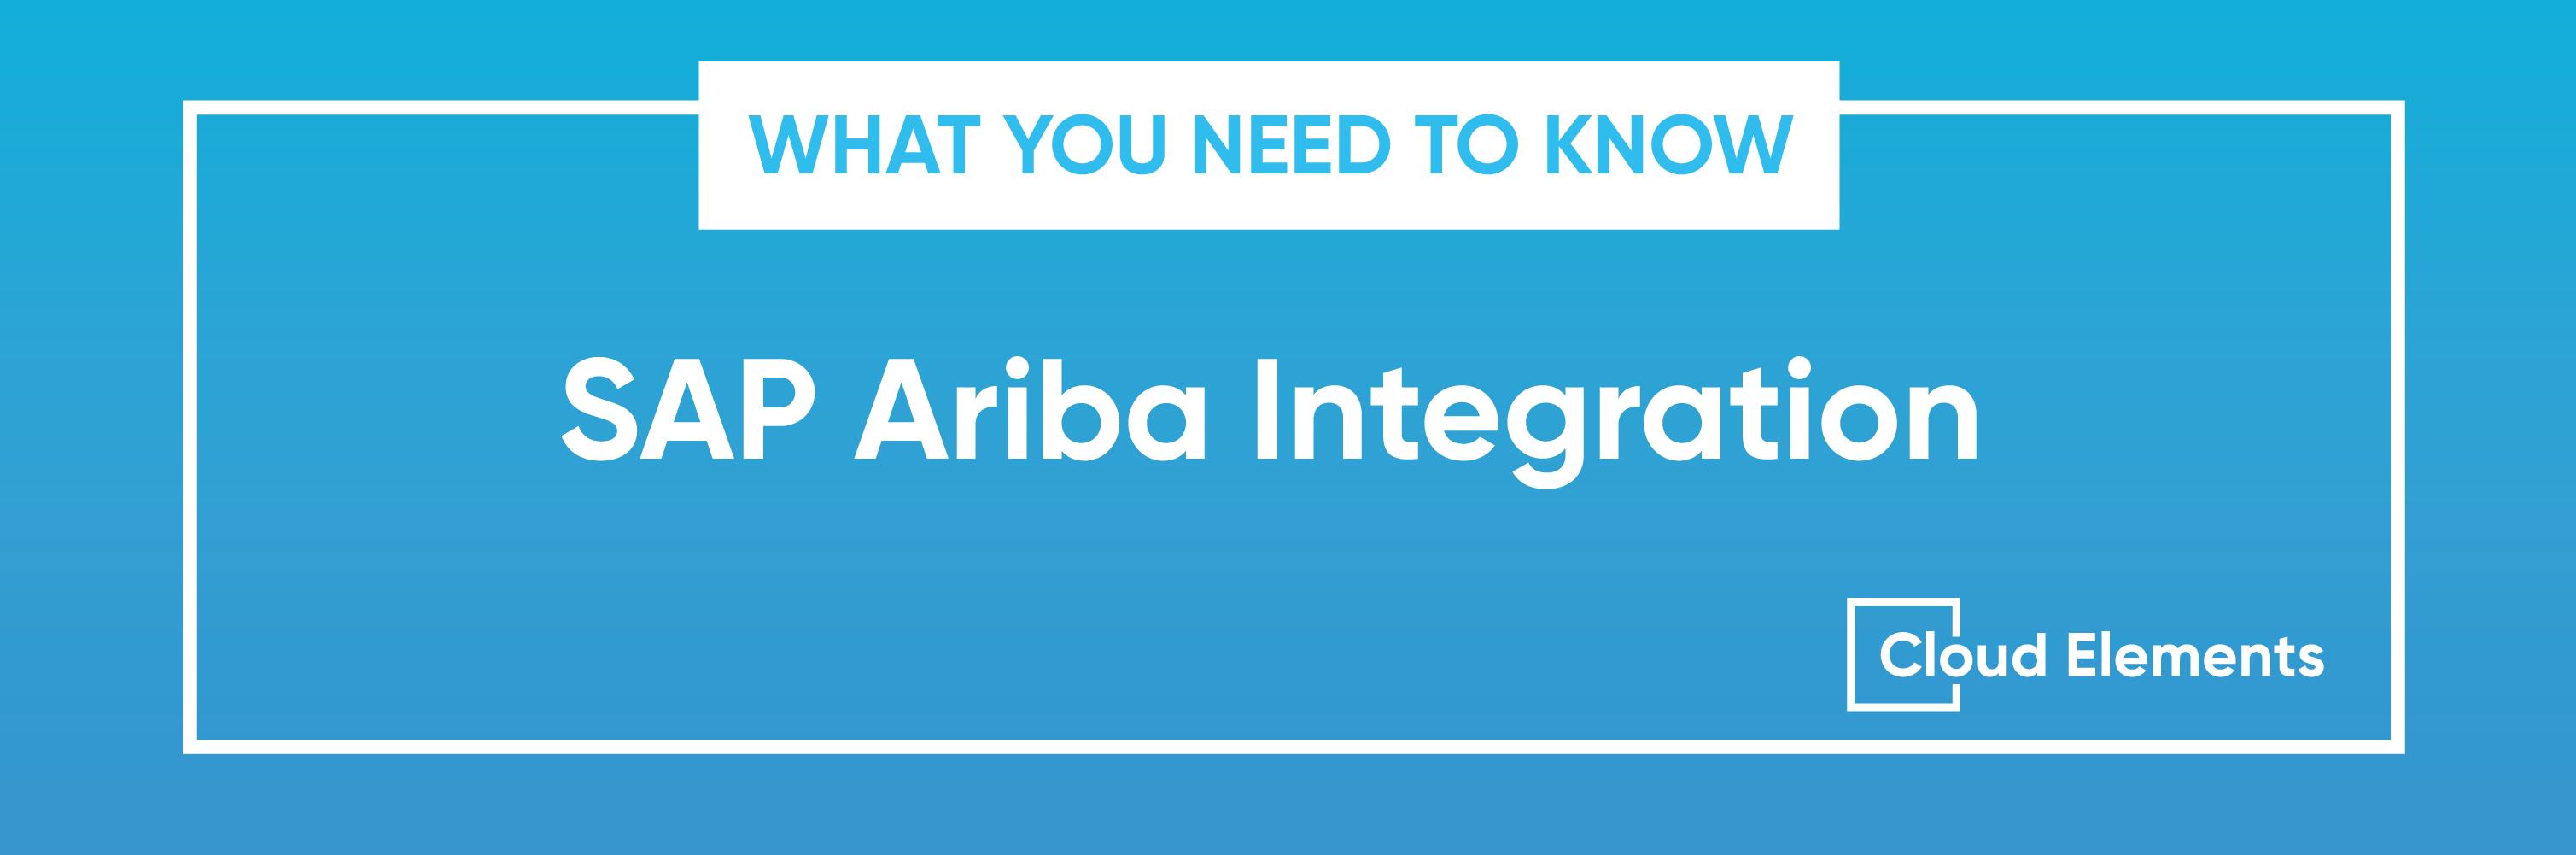 sap ariba integration